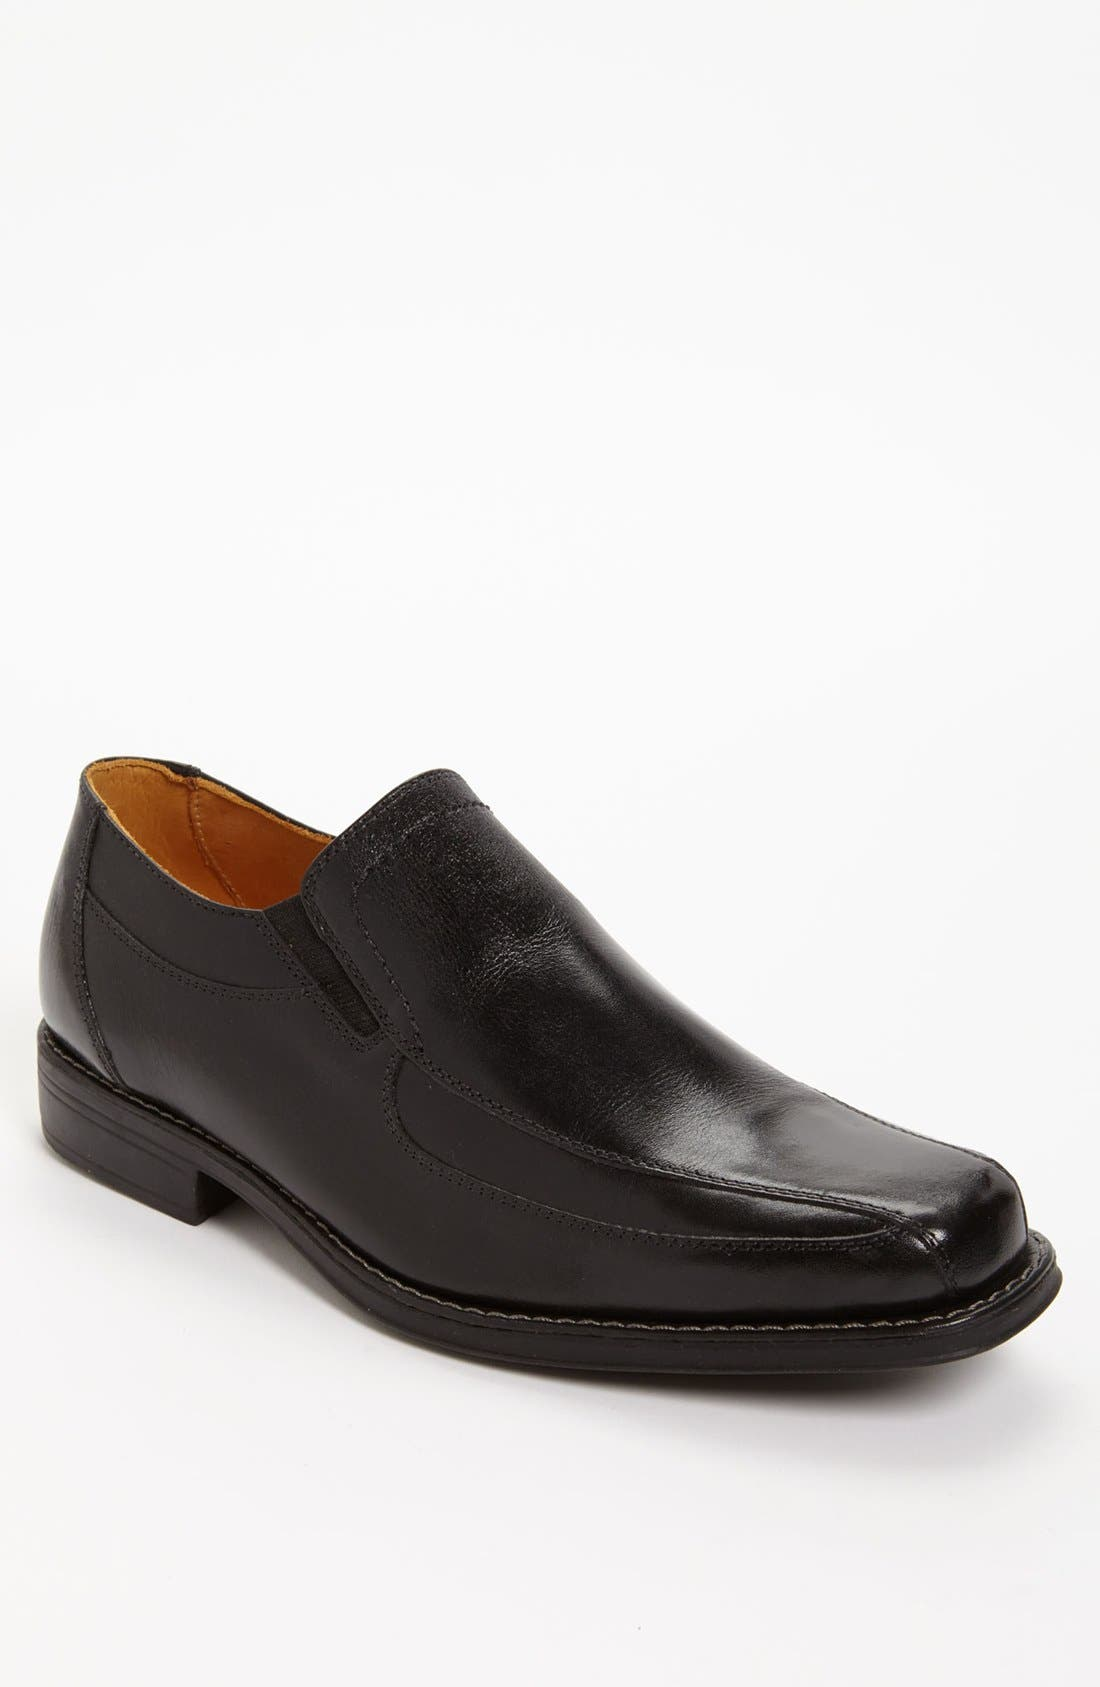 'Berwyn' Venetian Loafer,                         Main,                         color, BLACK